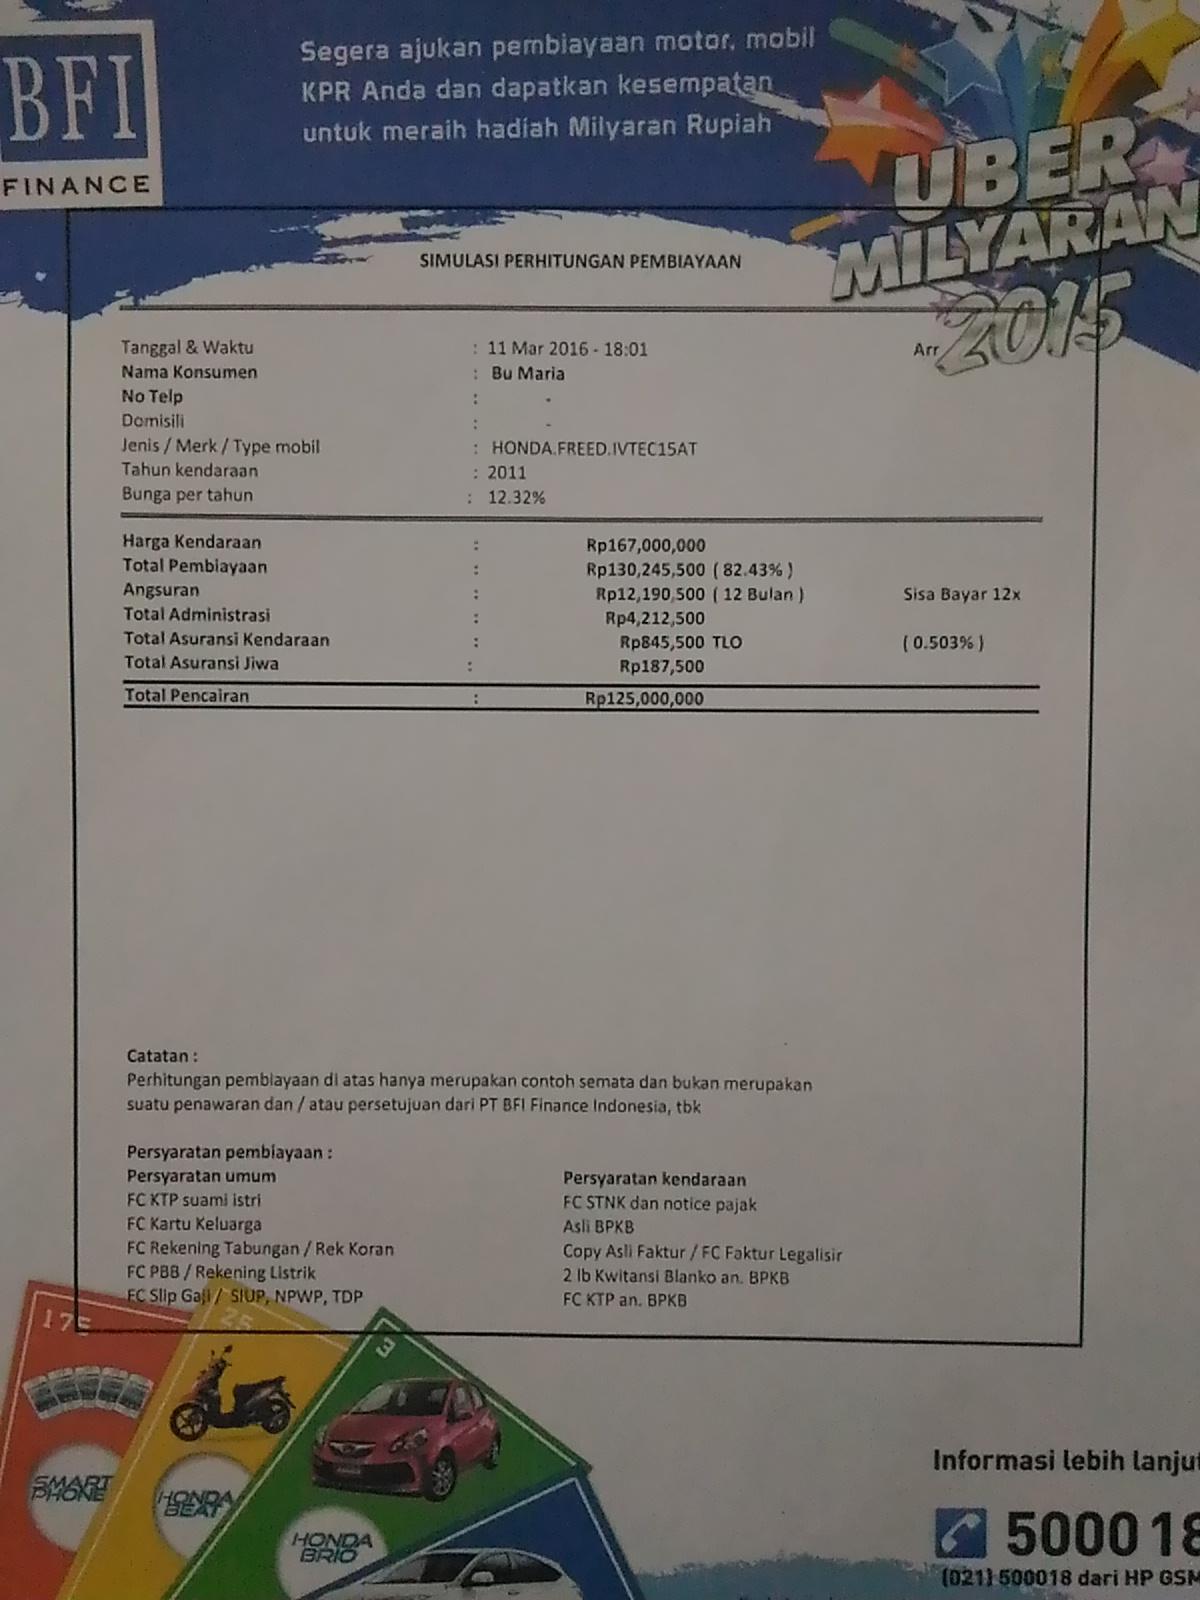 Info lengkap · Hubungi Mohamad Abduh S E CALL CENTER INFORMATION Tlp SMS Whats App PIN BBM D2202B9D